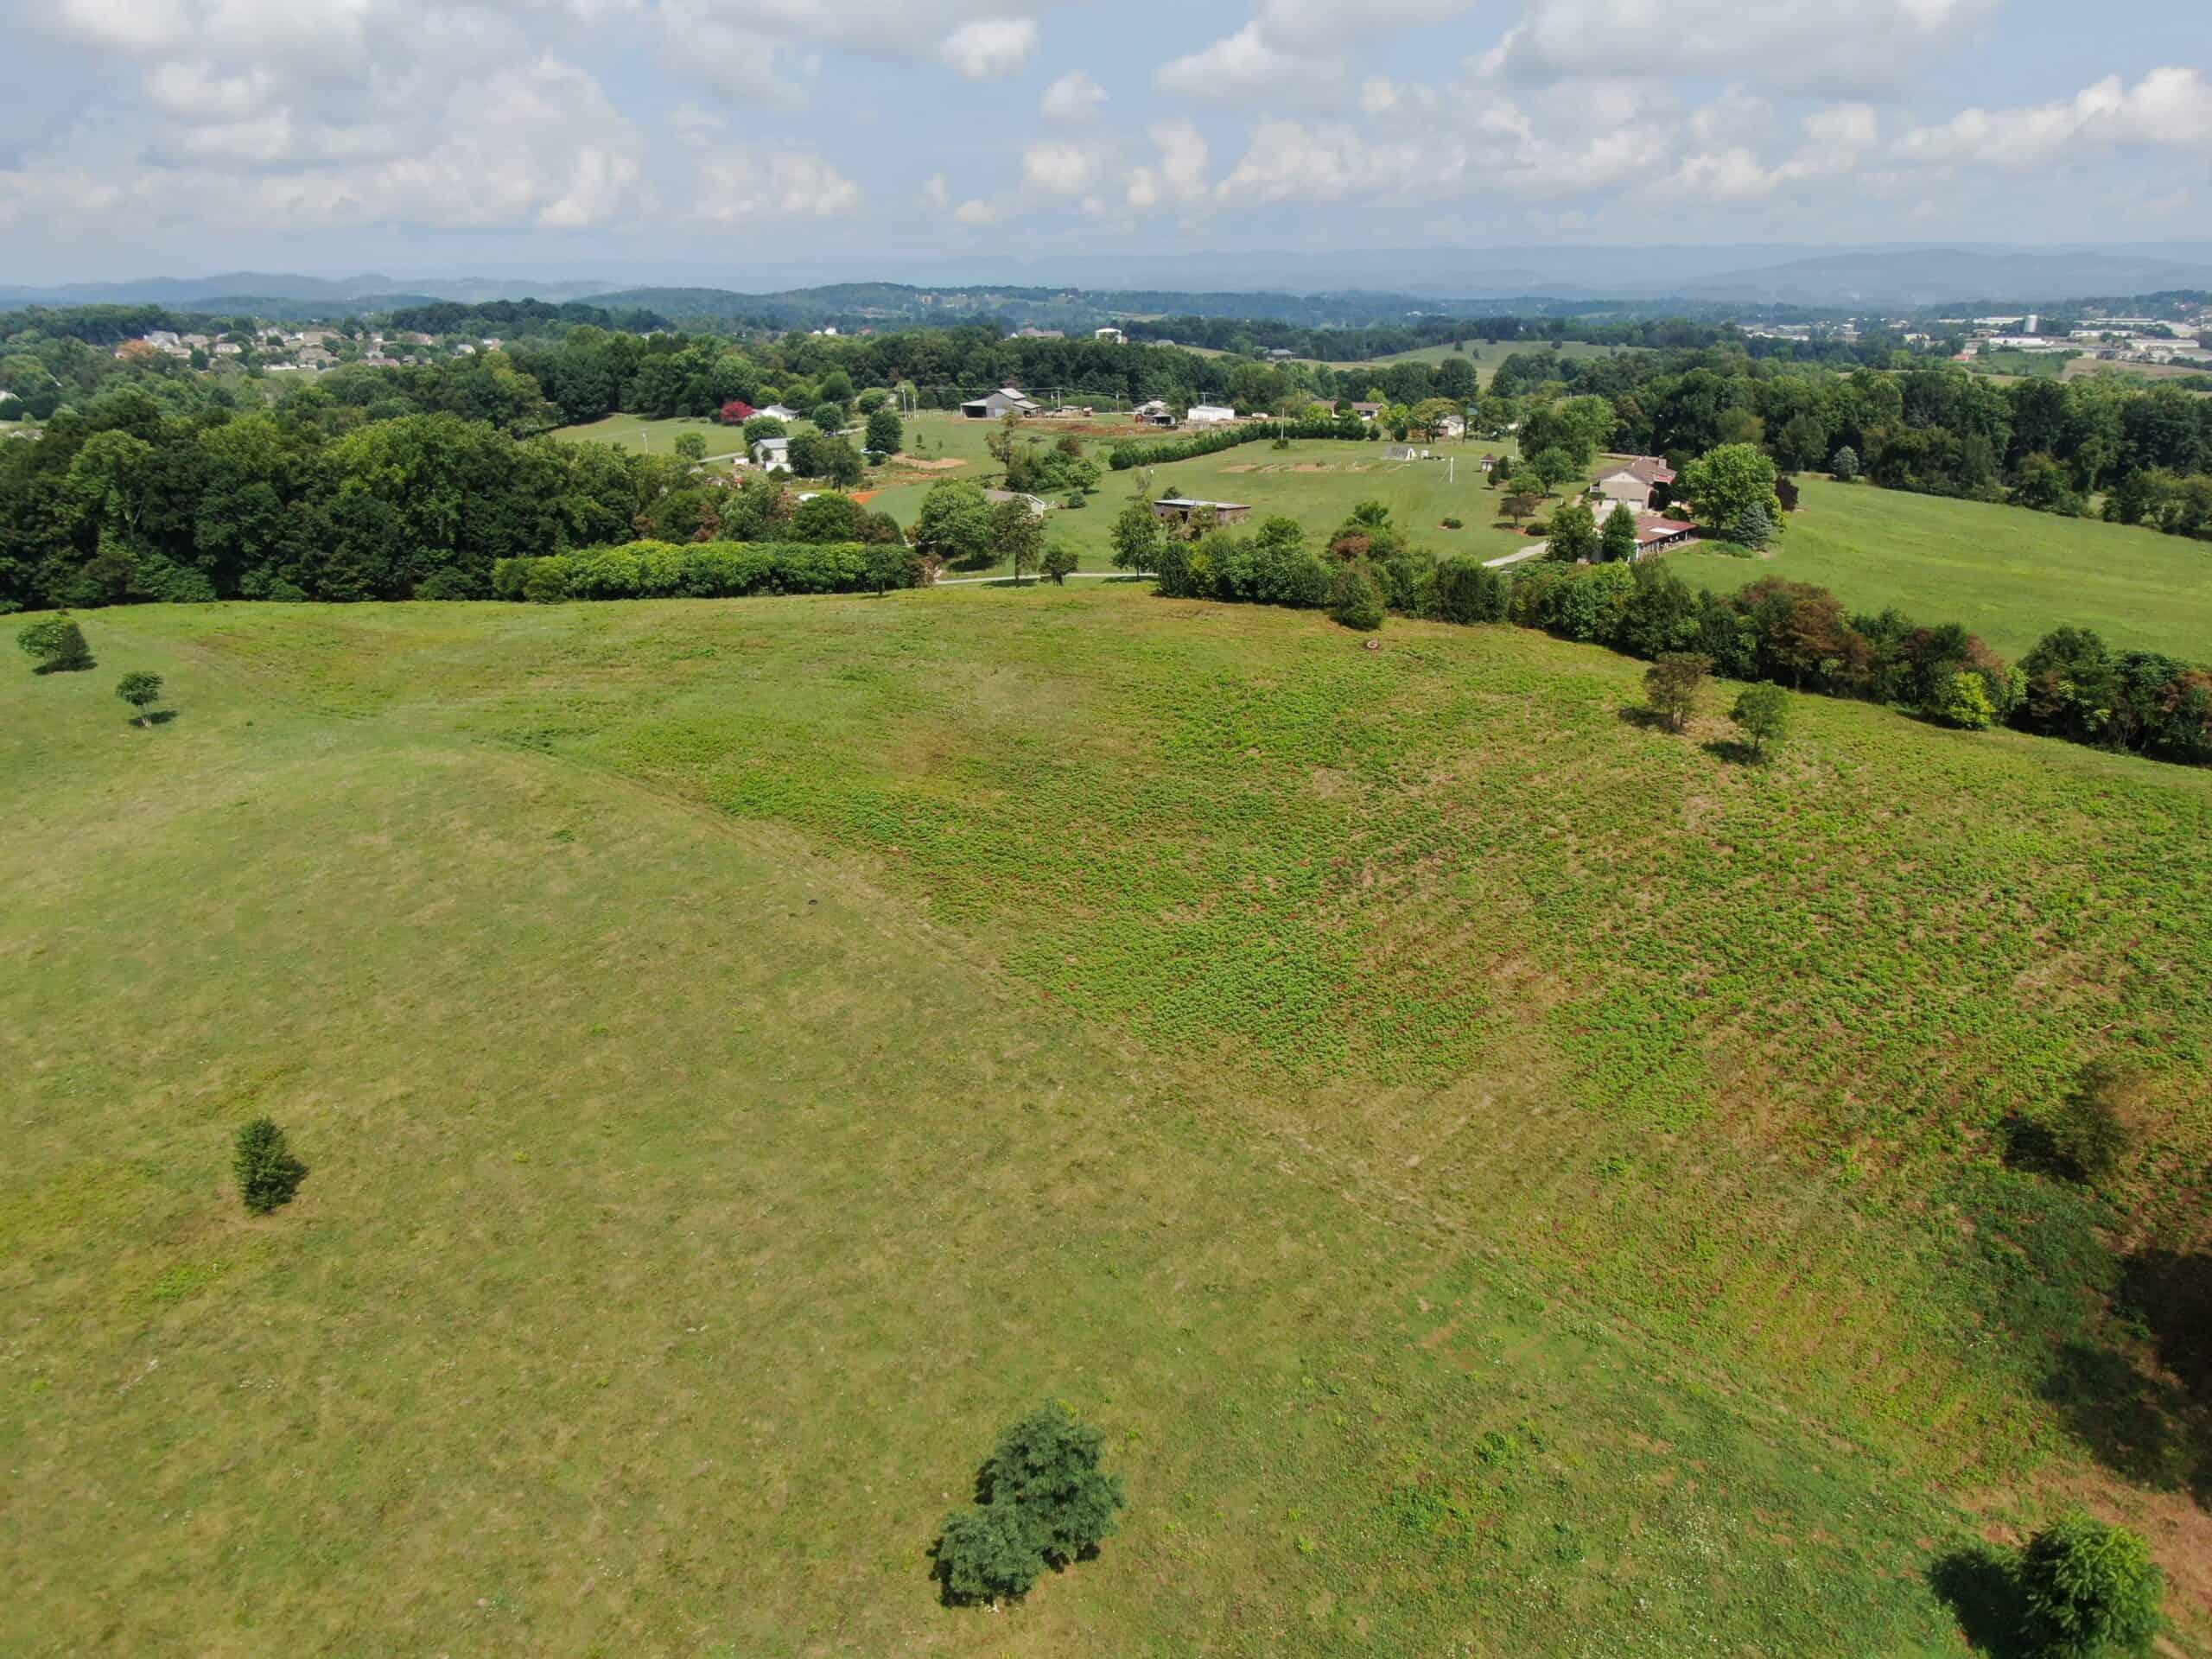 East Tennessee Farm for Sale Auction Hamblen County 9/11/2021 at 10:30 AM EST